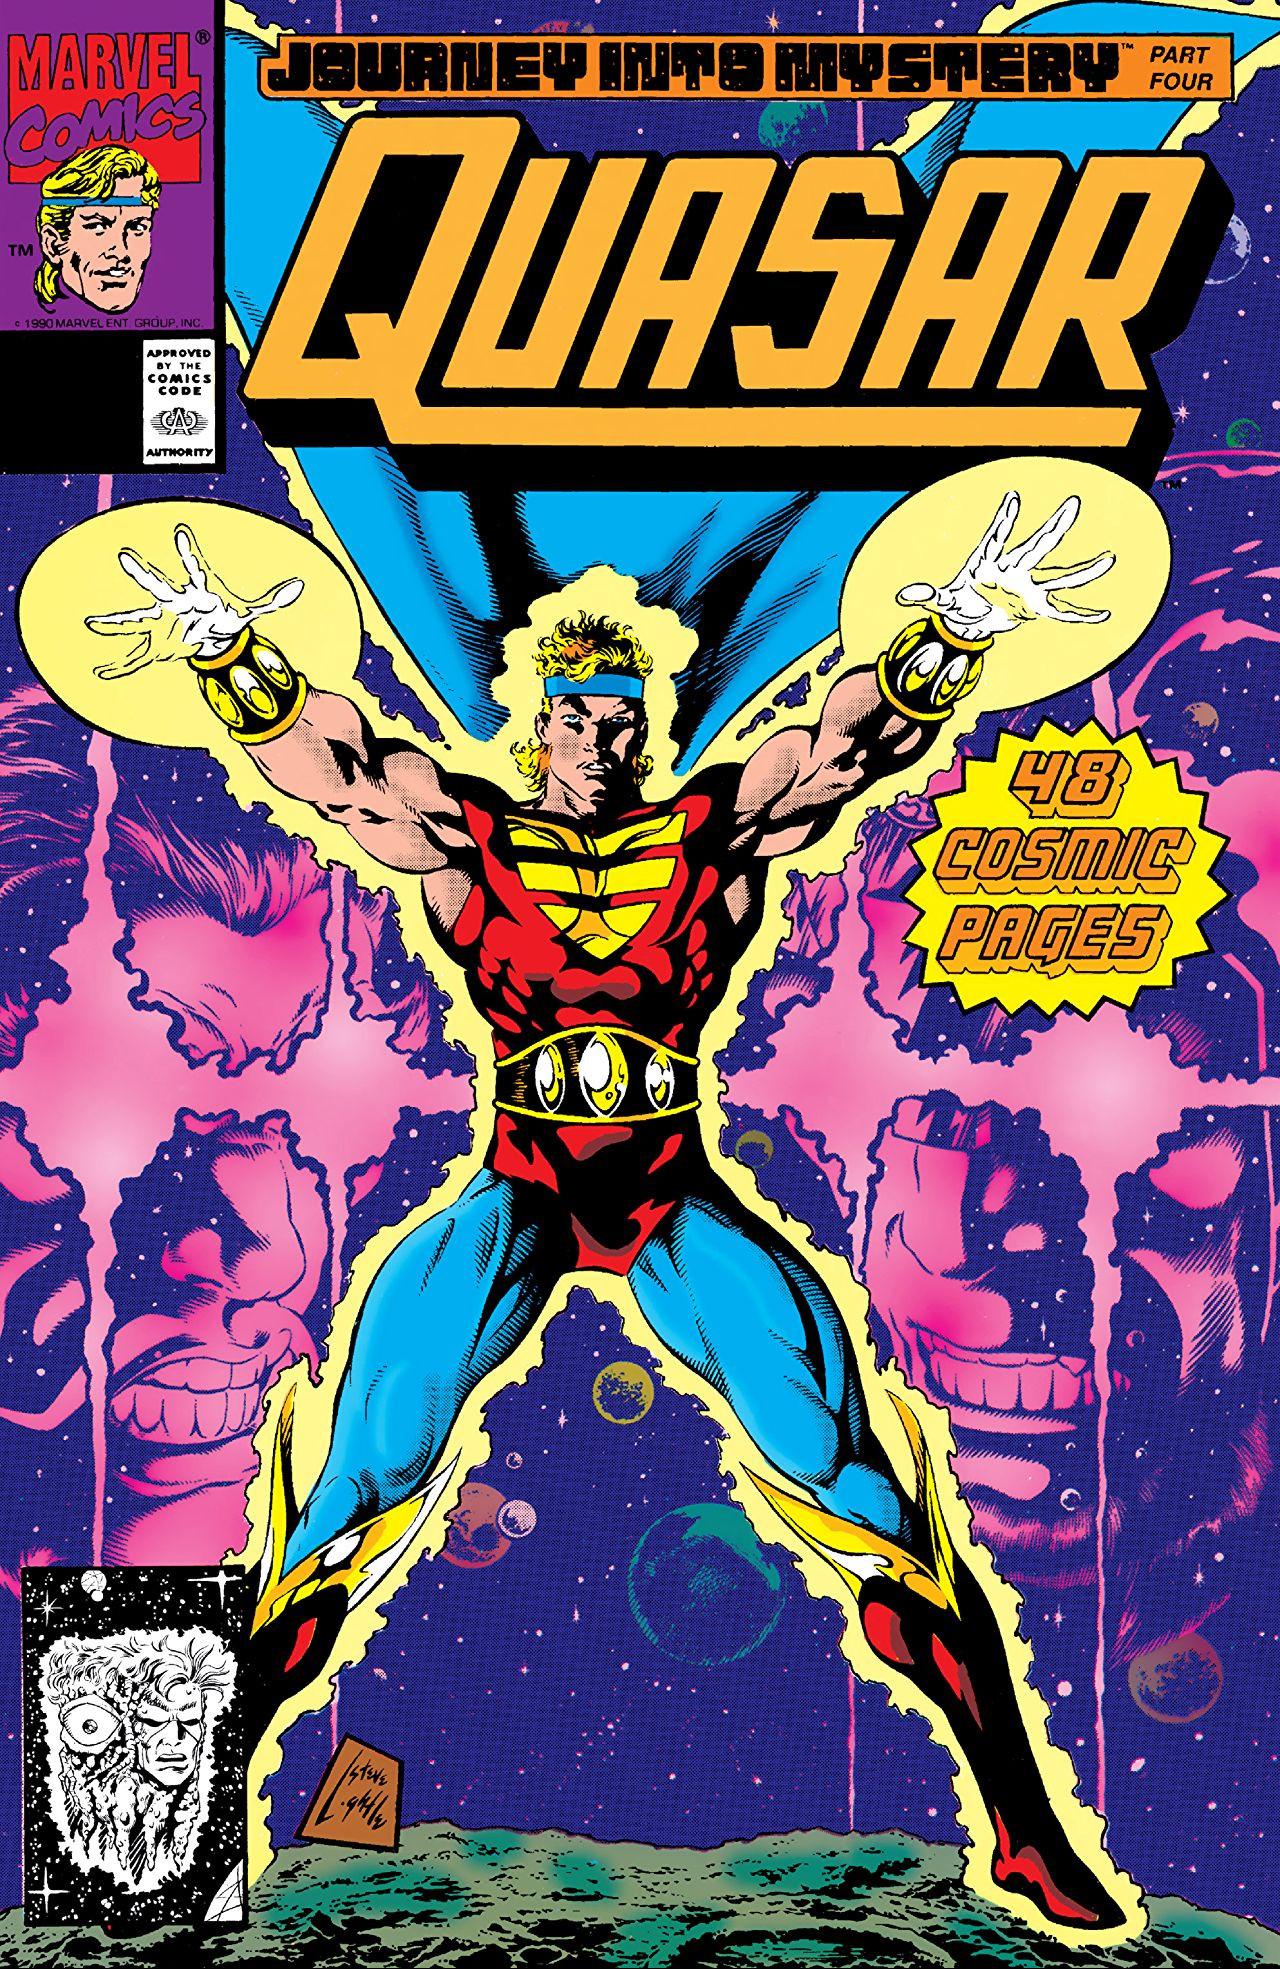 Quasar Vol 1 16 Marvel Database Fandom Powered By Wikia